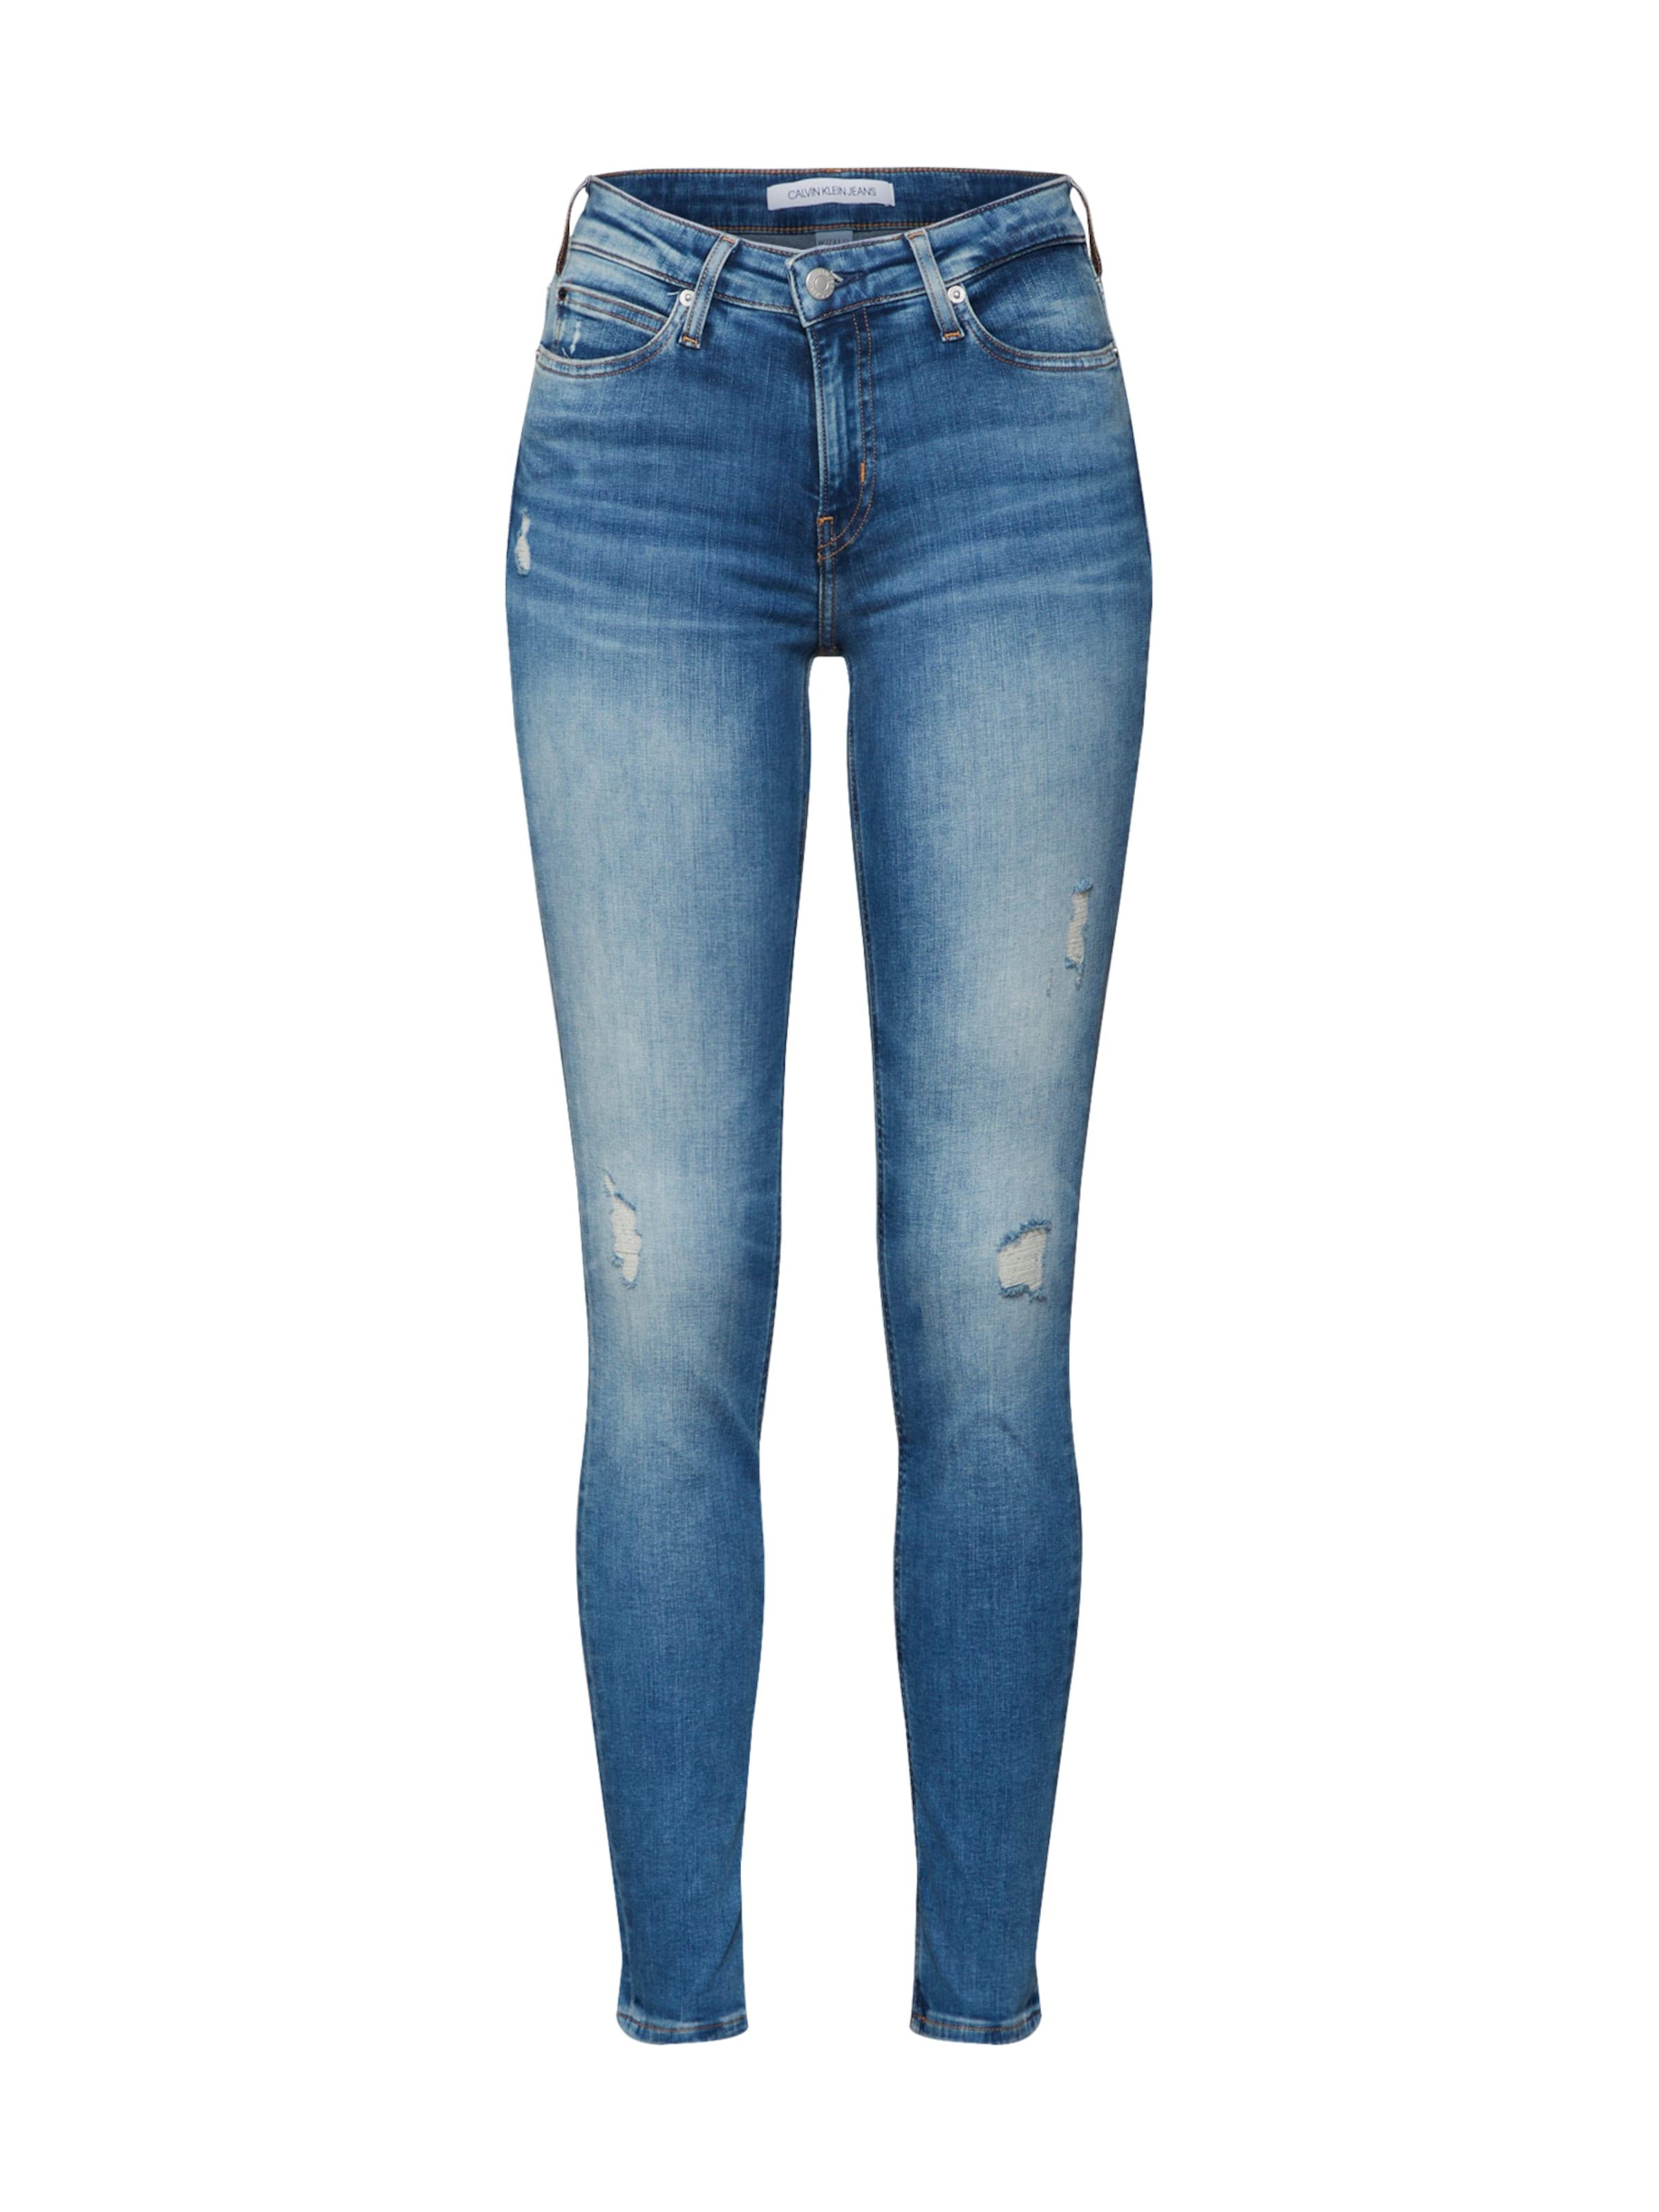 Klein Denim Jeans Calvin In Blue nw0kOP